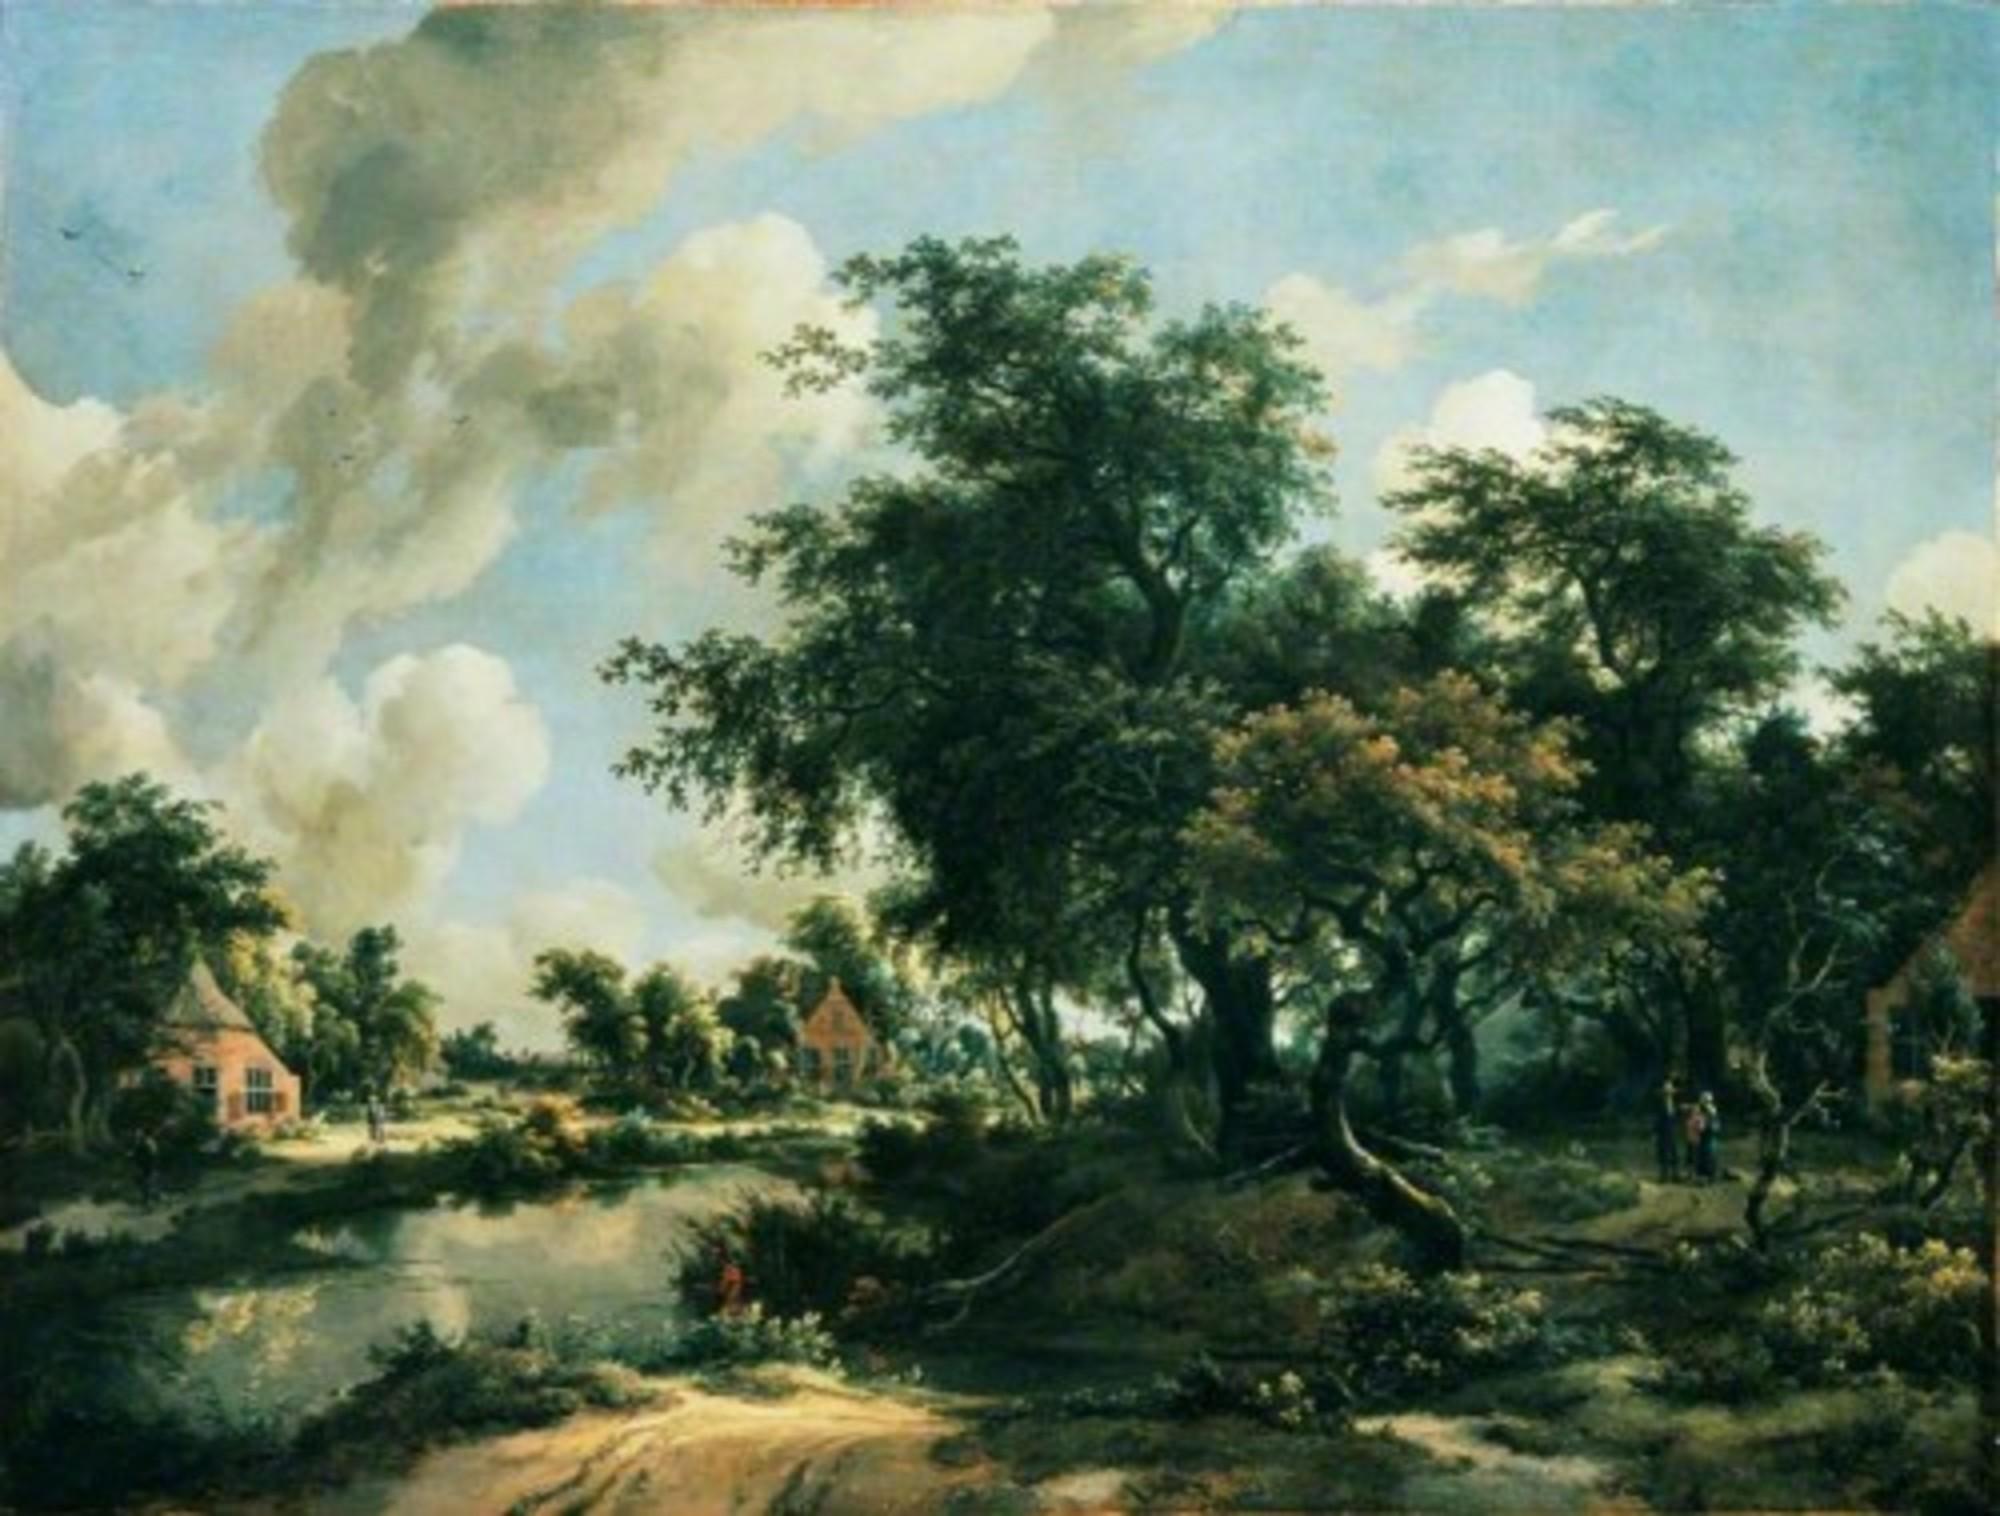 Meindert-Hobbema---A-Stormy-Landscape-WLC-WLC-P75.jpg